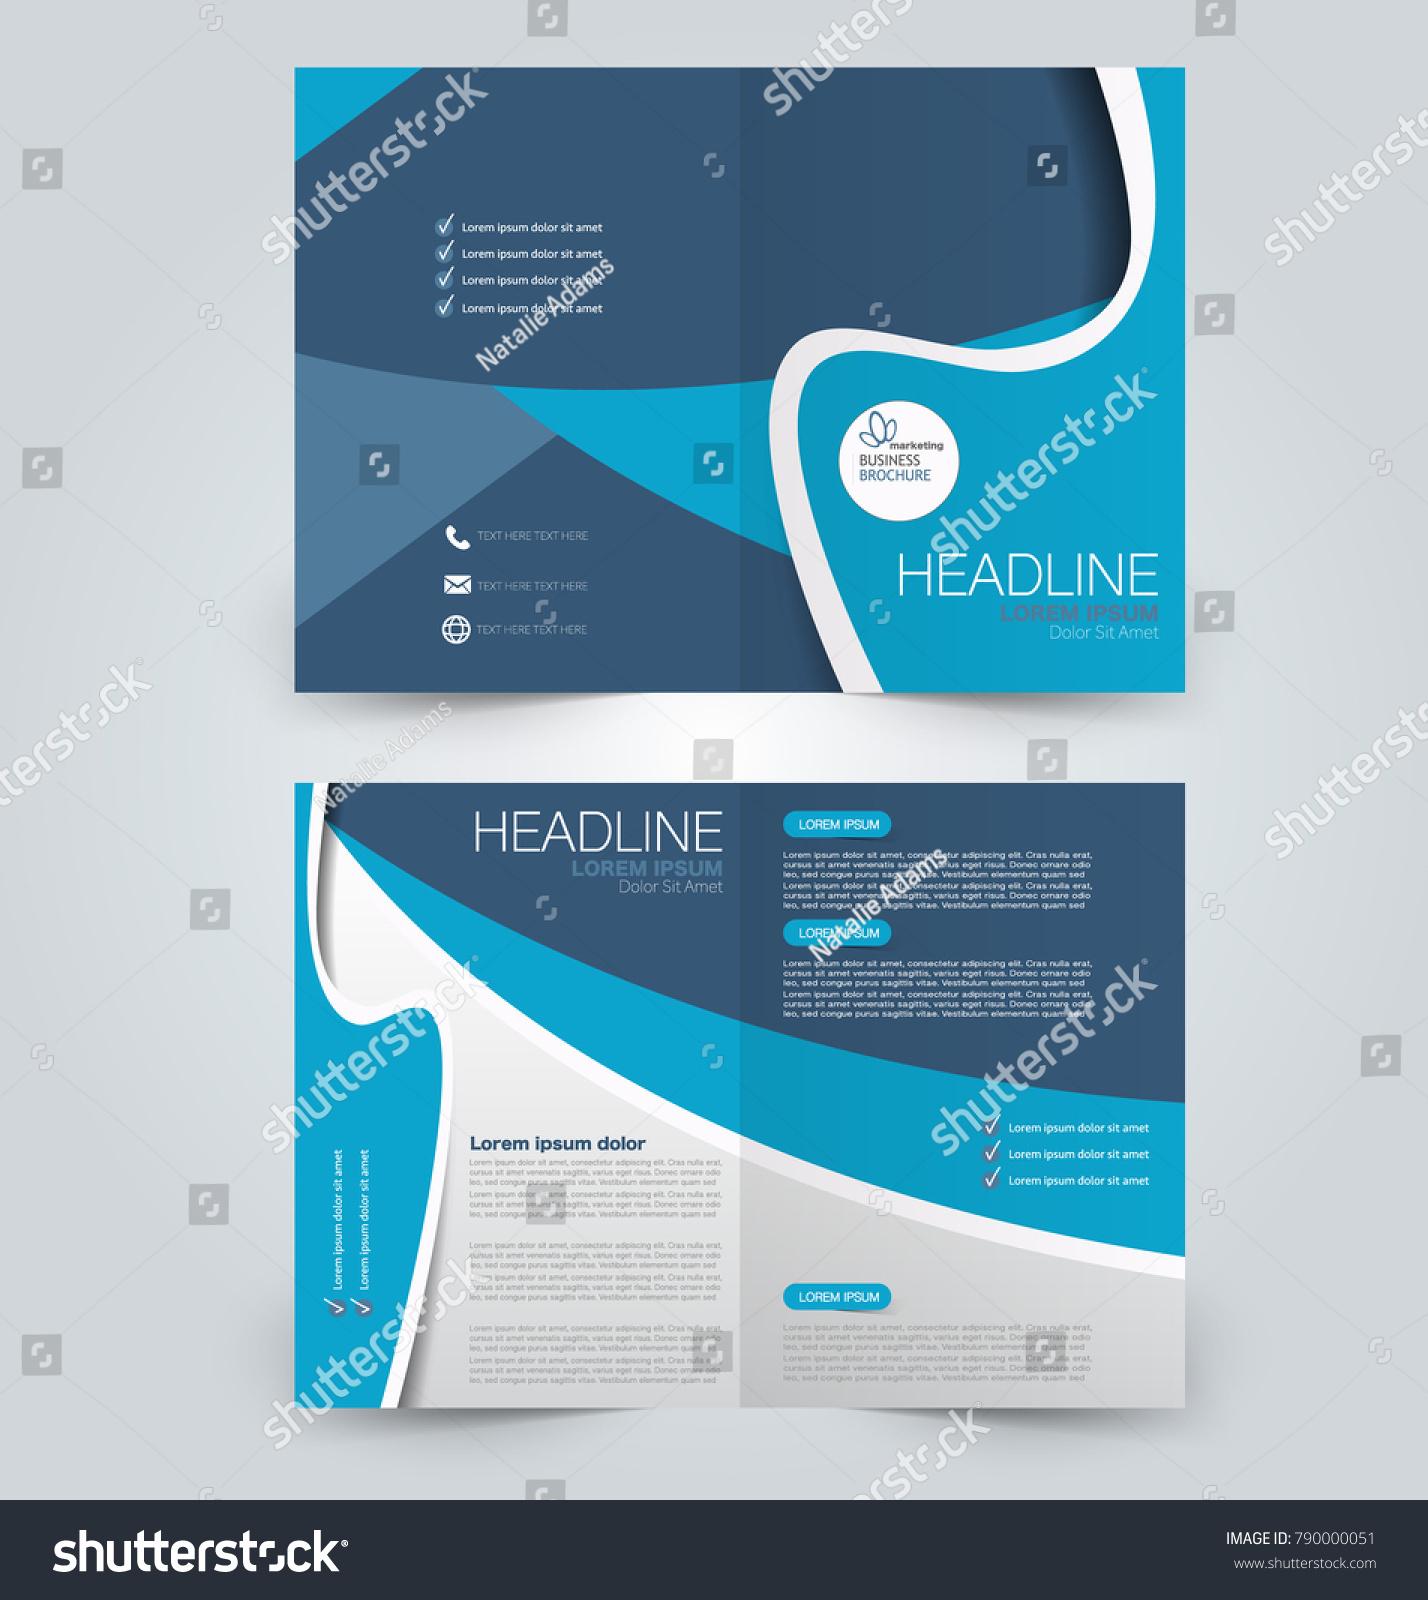 Fold Brochure Template Flyer Background Design Stock Vector ...